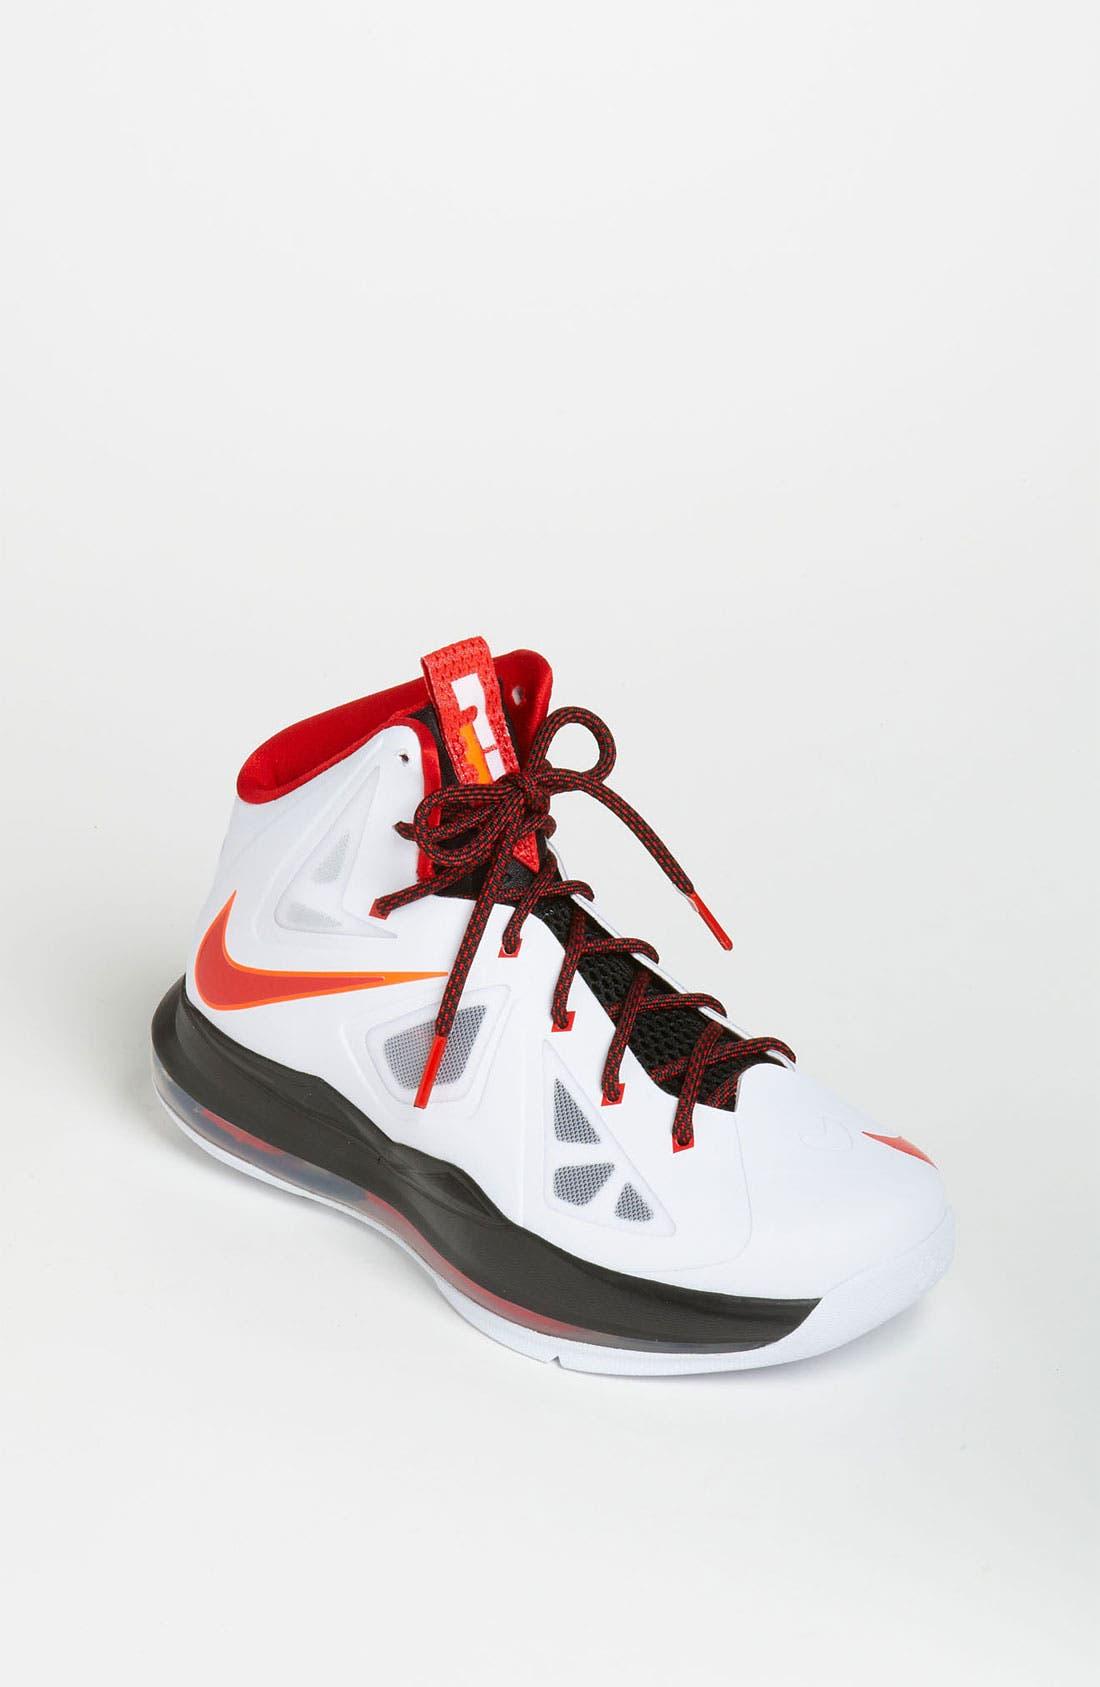 Alternate Image 1 Selected - Nike 'LeBron 10 Pressure' Basketball Shoe (Big Kid)